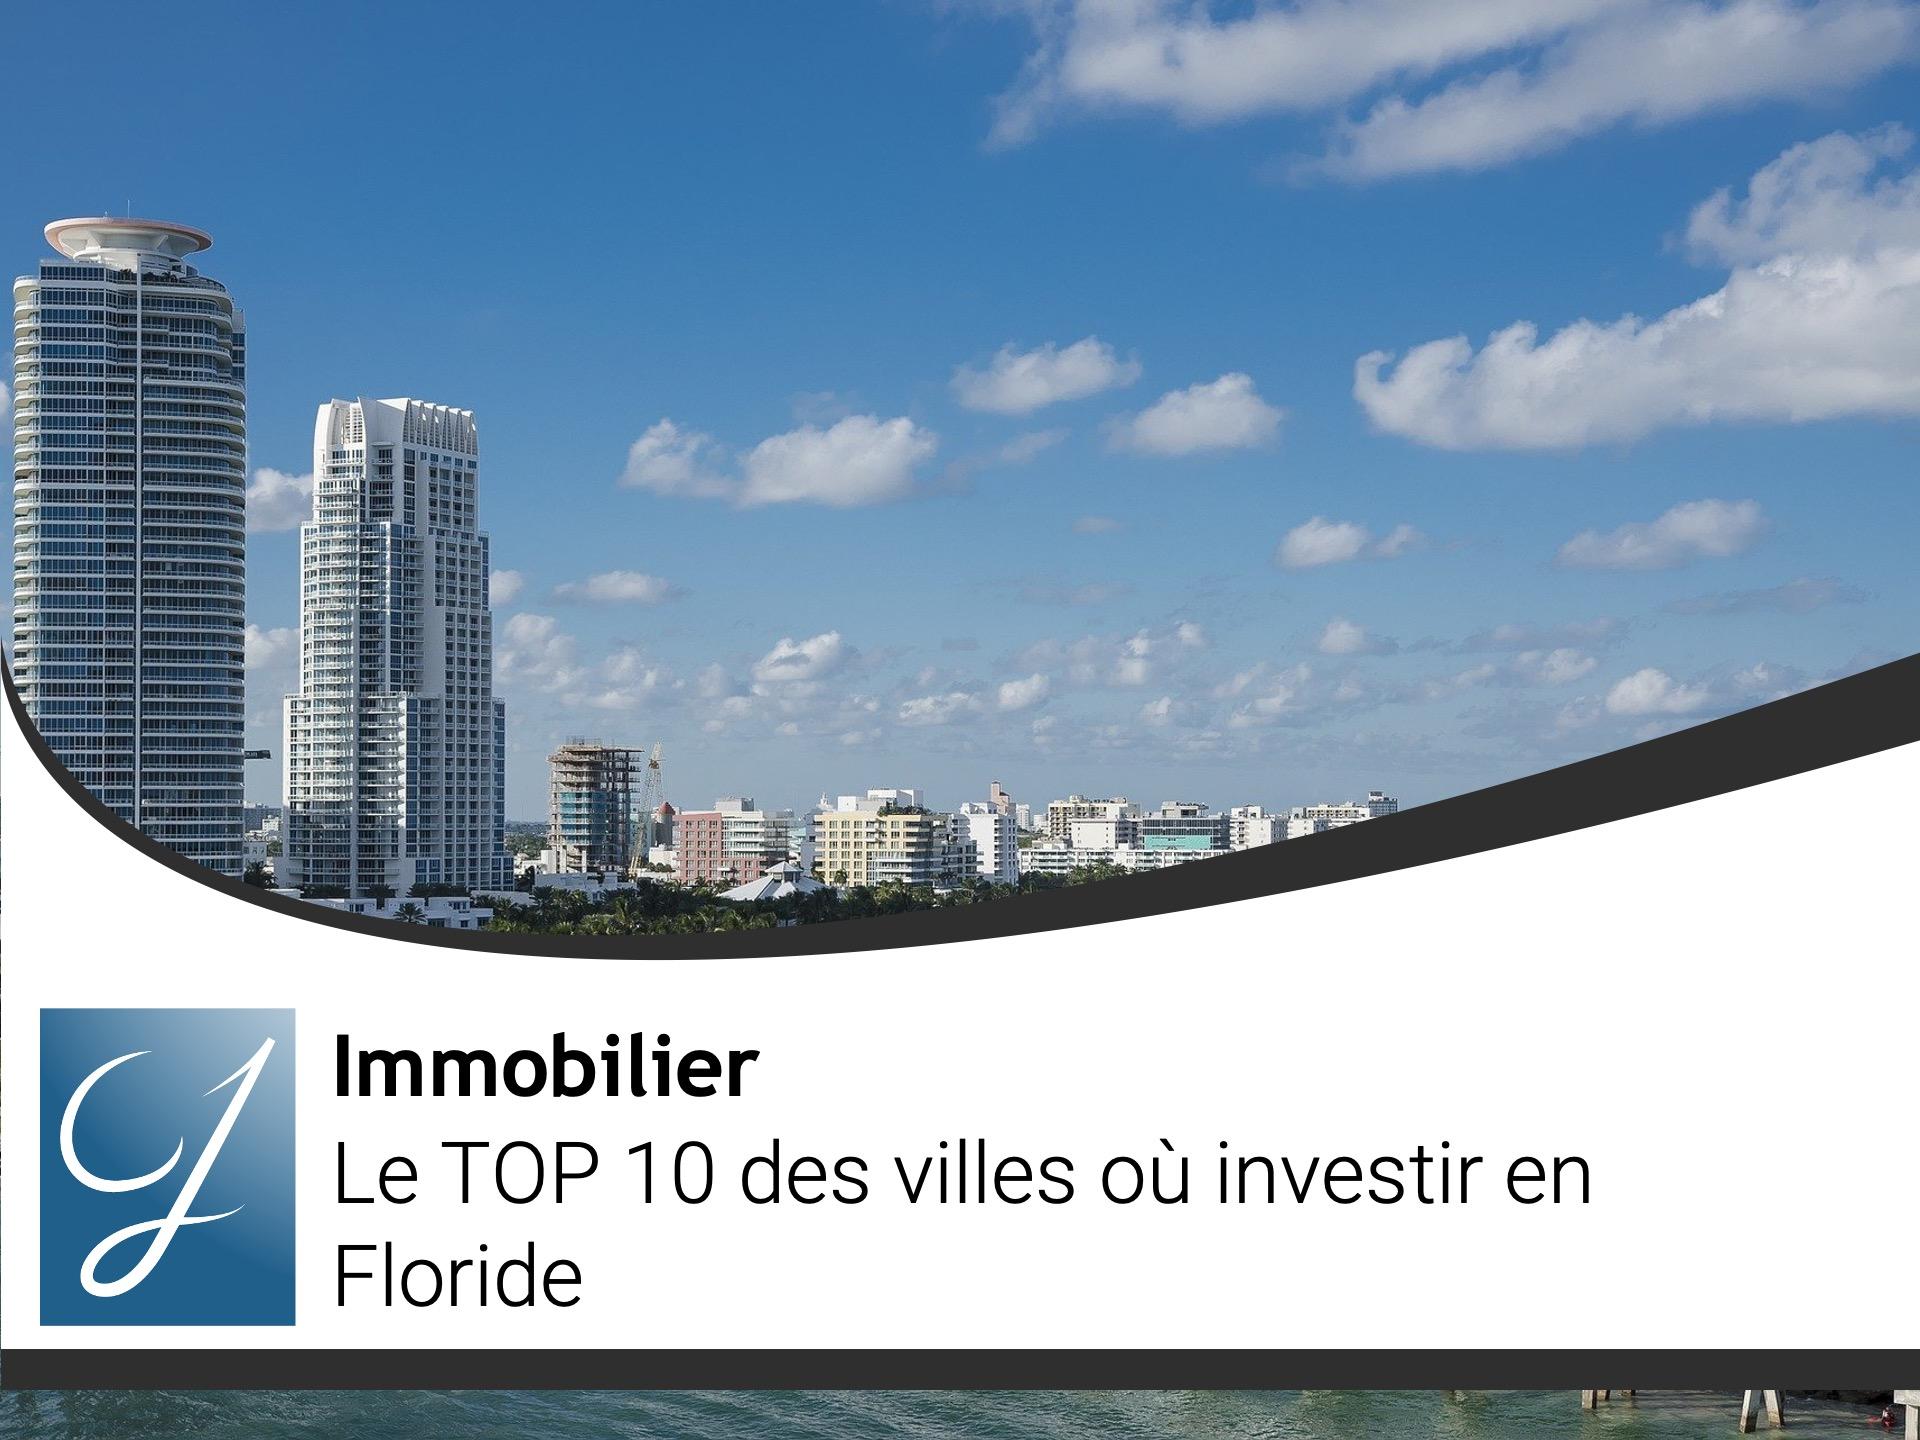 Investir en Floride – Immobilier en Floride – TOP 10 des villes où investir